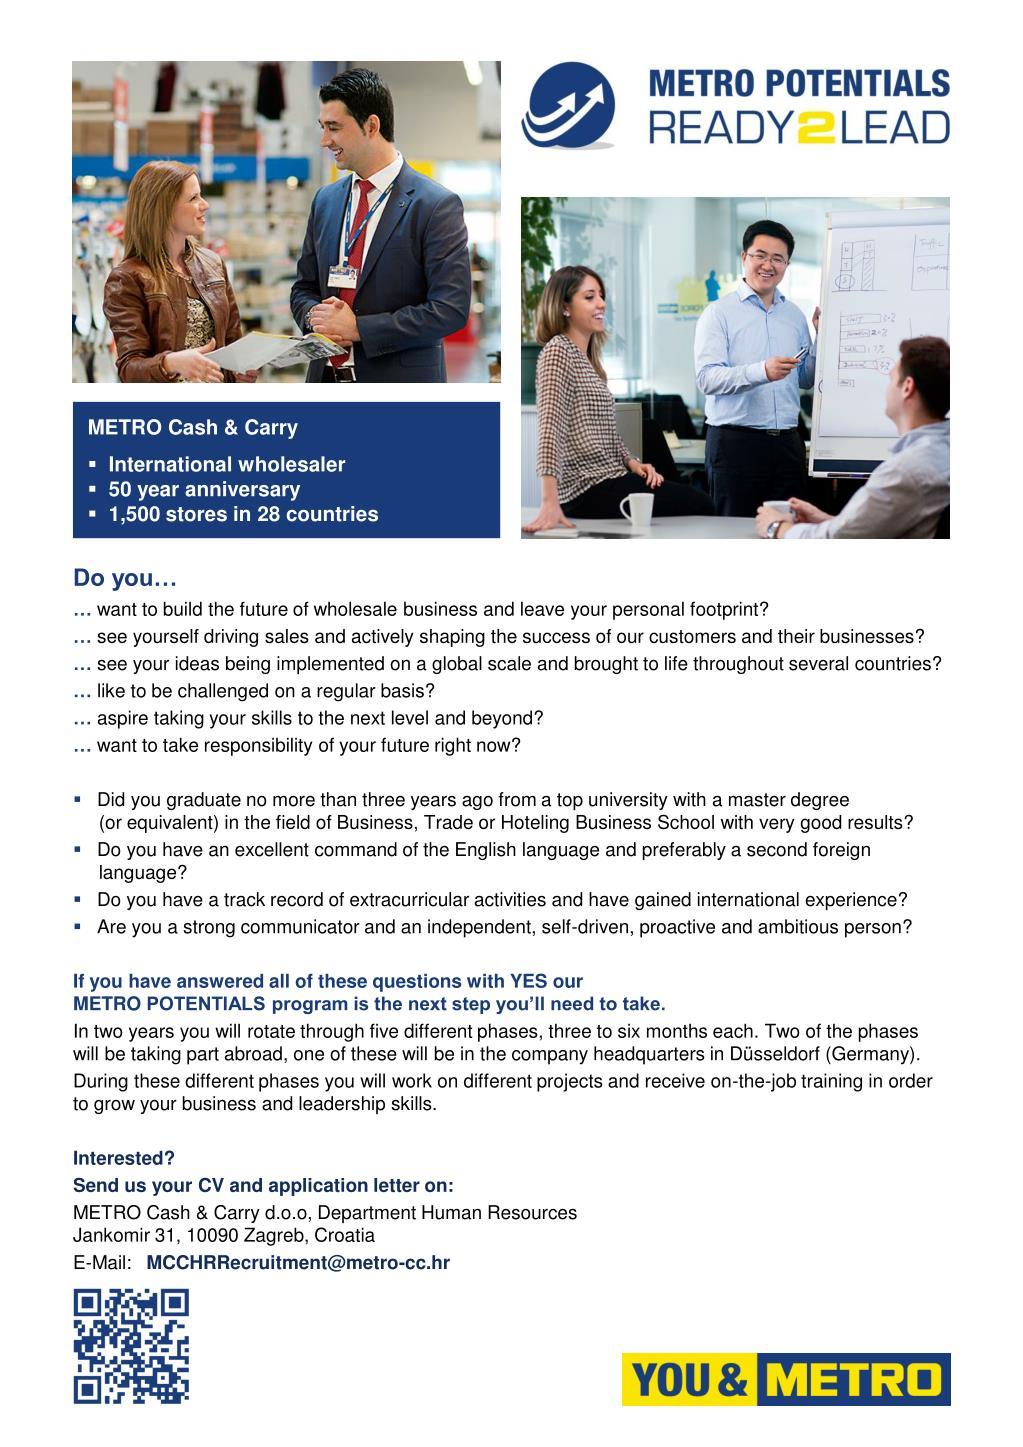 Ppt Metro Cash Carry International Wholesaler 50 Year Anniversary Powerpoint Presentation Id 6897104